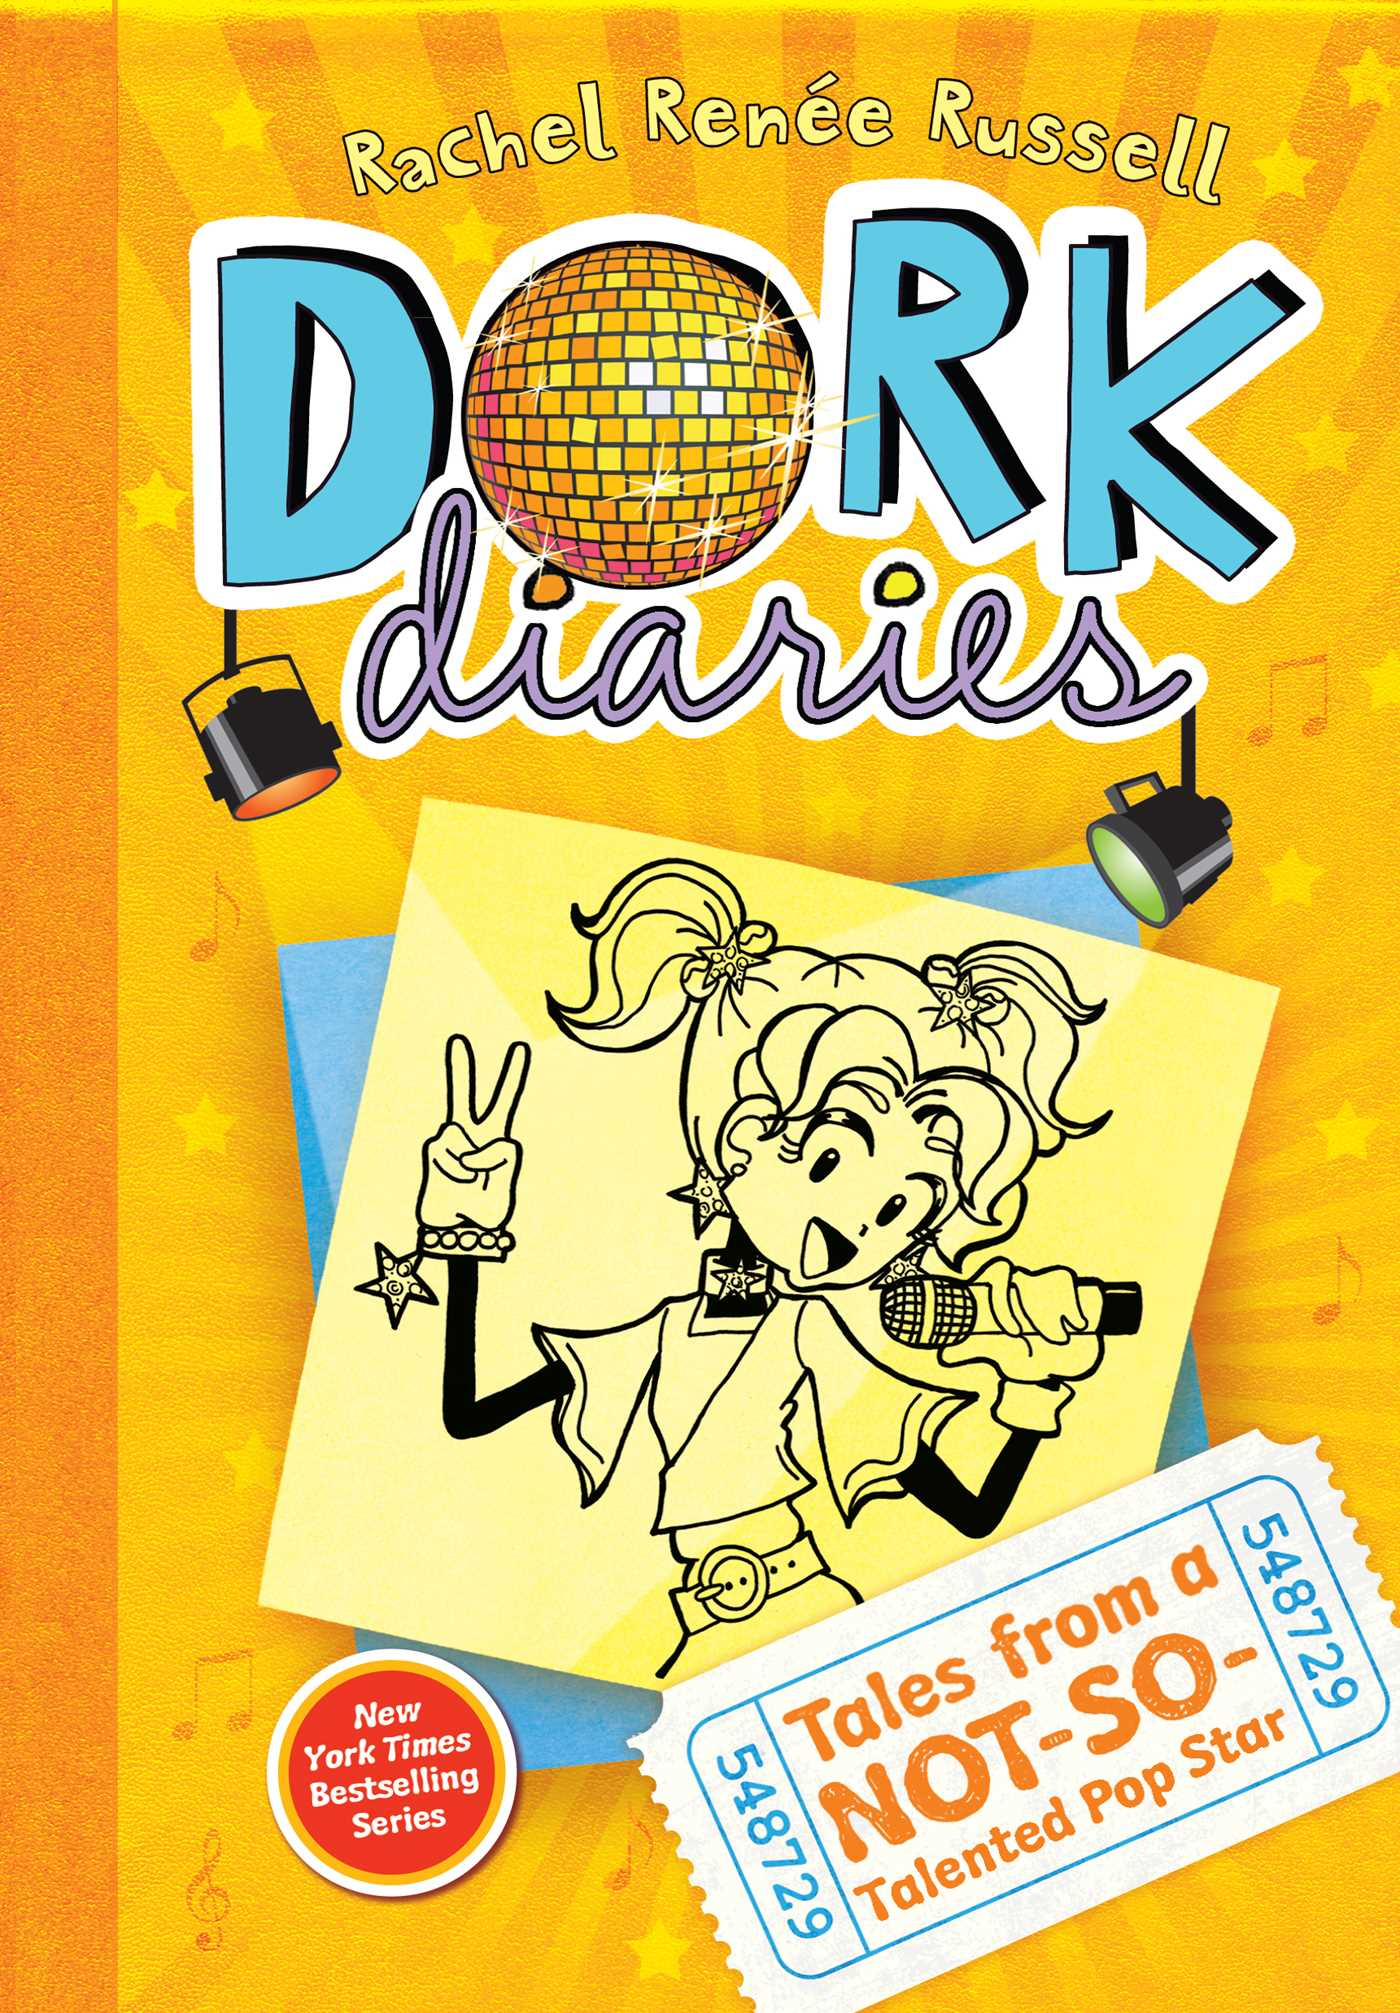 Dork diaries 3 enhanced ebook edition 9781442441231 hr